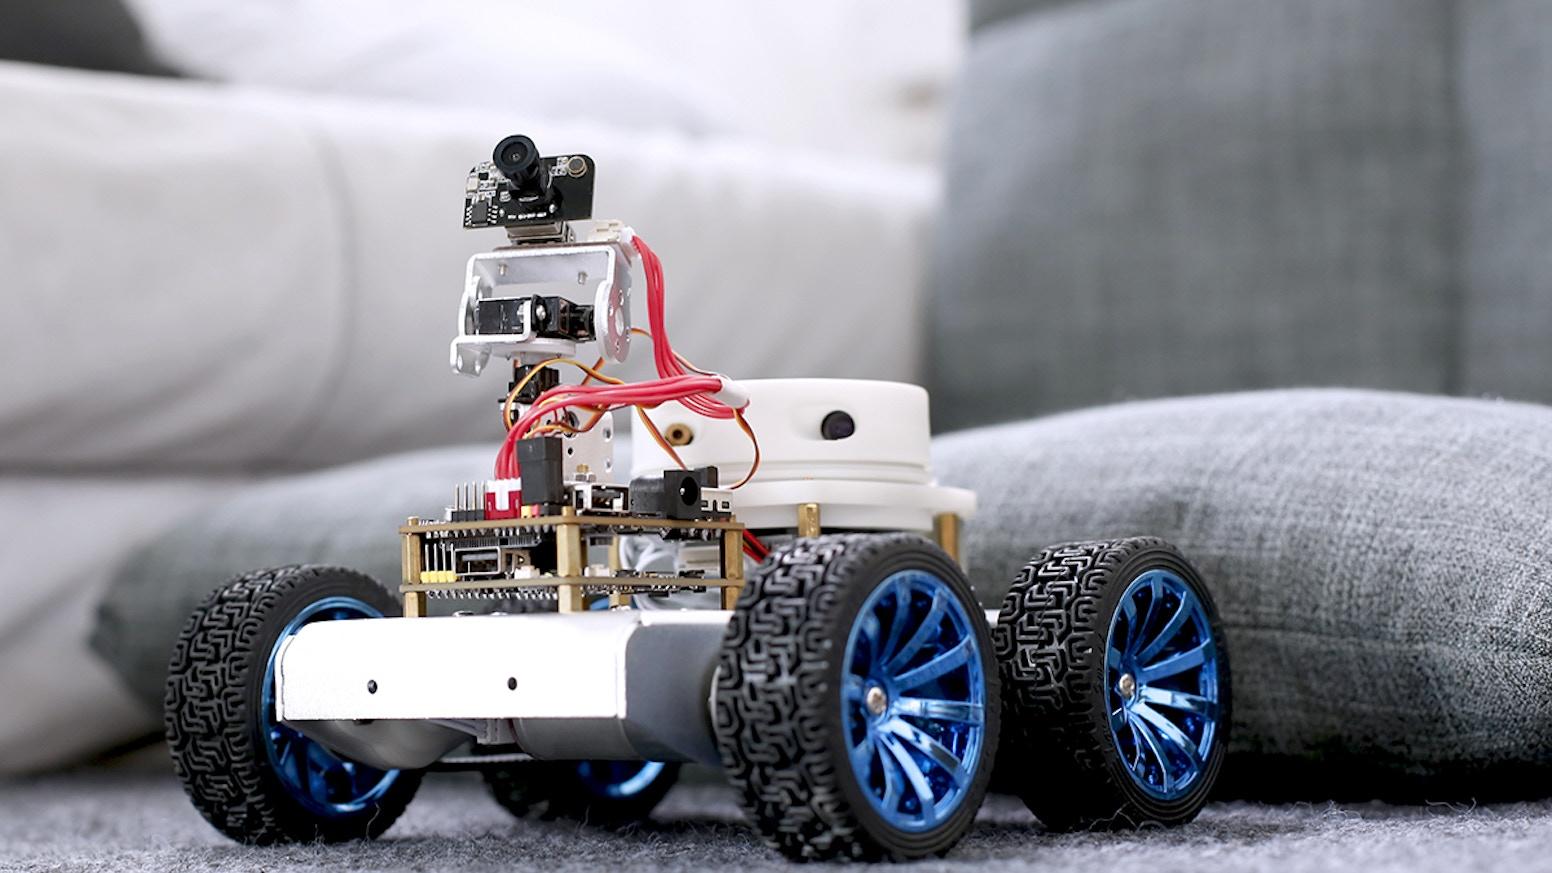 Crazypi The True Robot Kit For Diy Robot Lovers By Crazypi